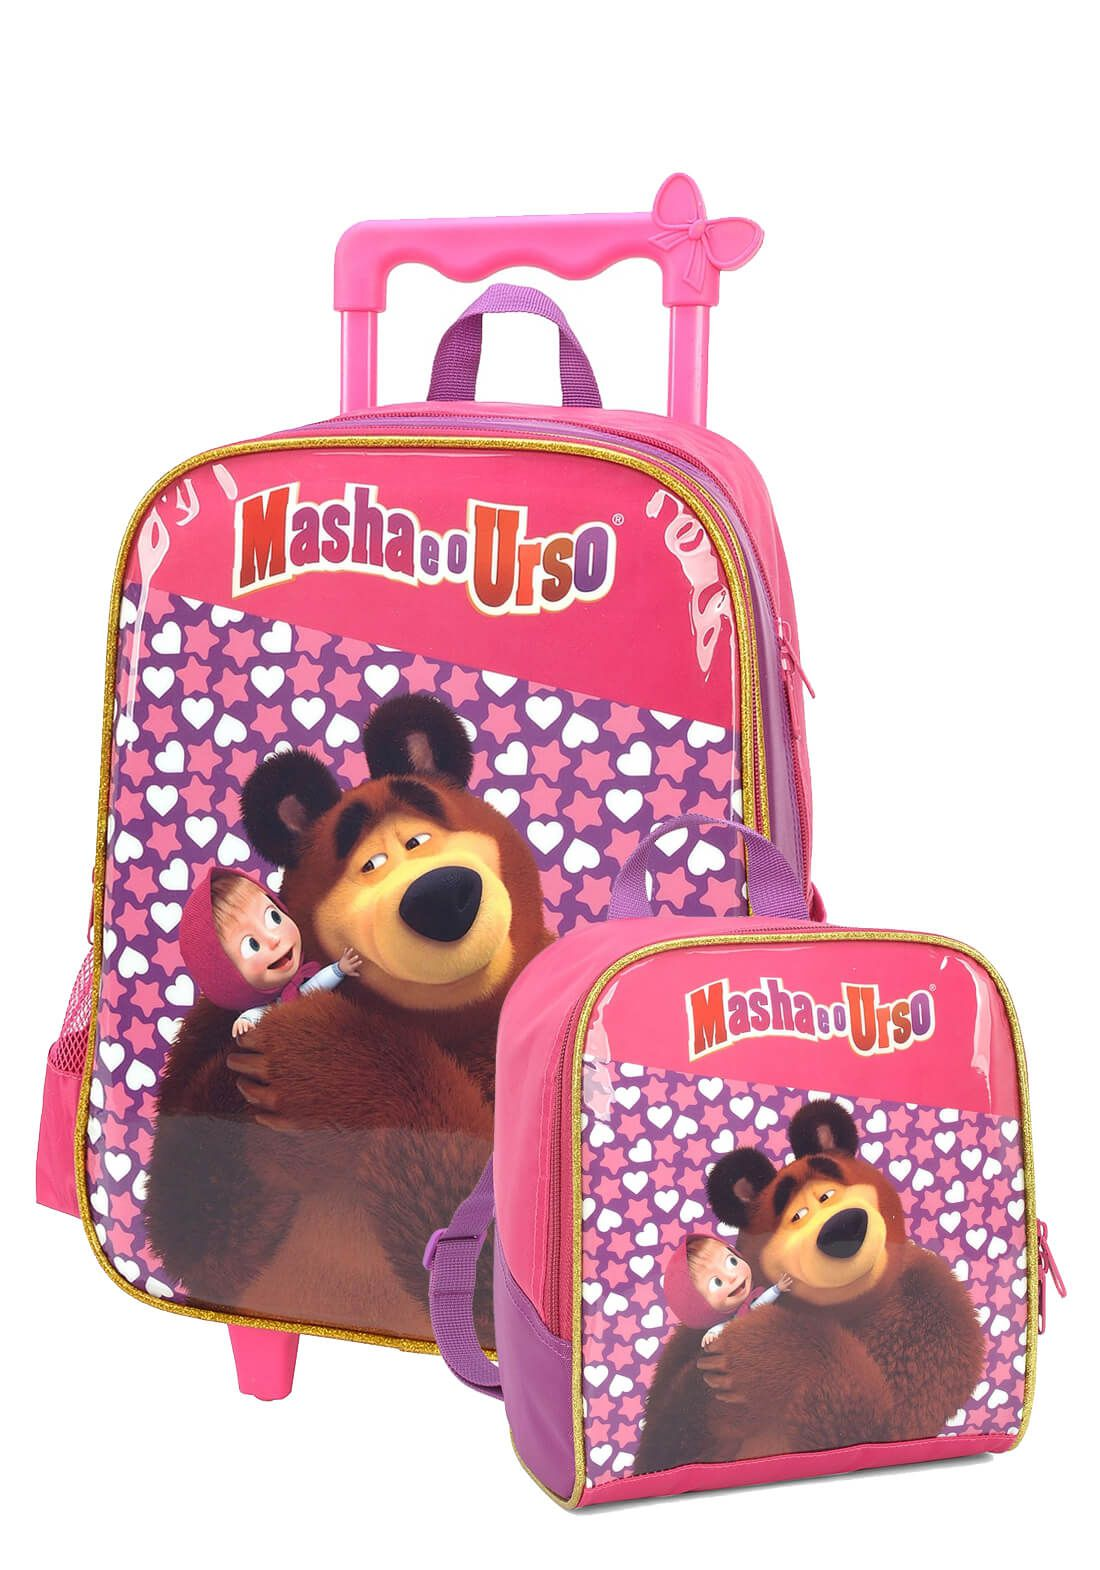 Kit Mochila Rodinha + Lancheira Masha e o Urso Roxo Original